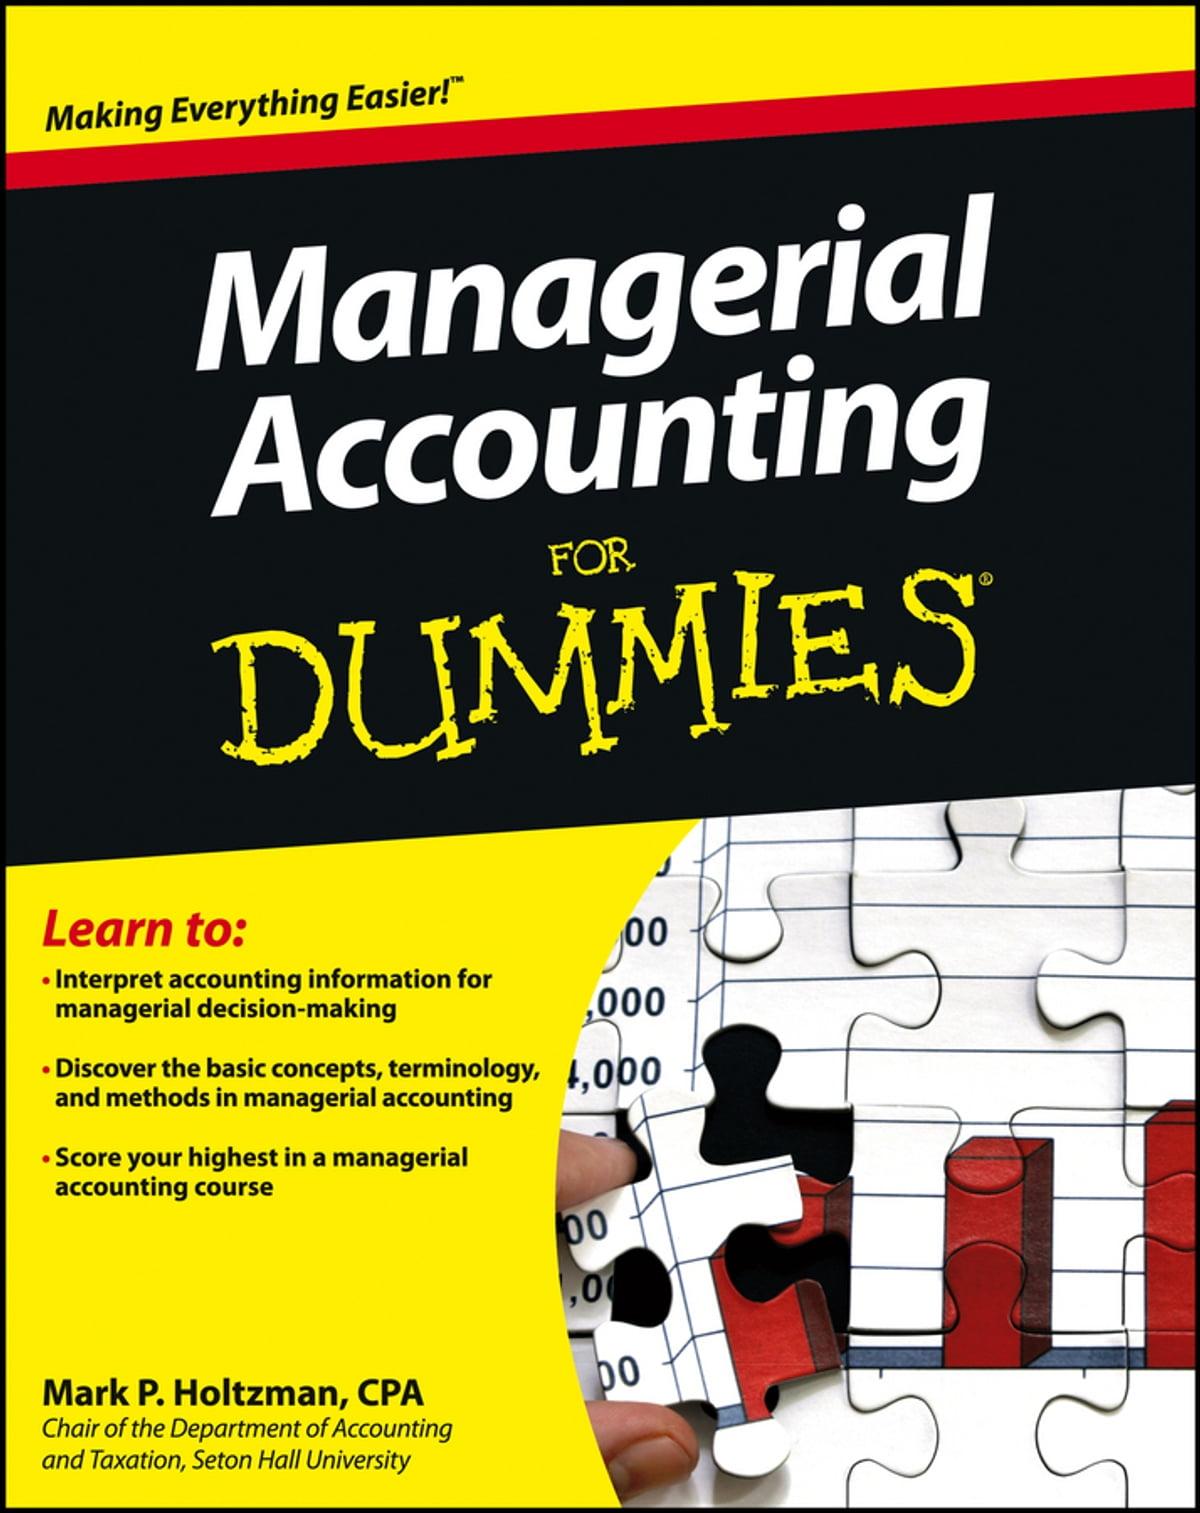 Managerial Accounting For Dummies eBook by Mark P. Holtzman - 9781118237649 | Rakuten Kobo